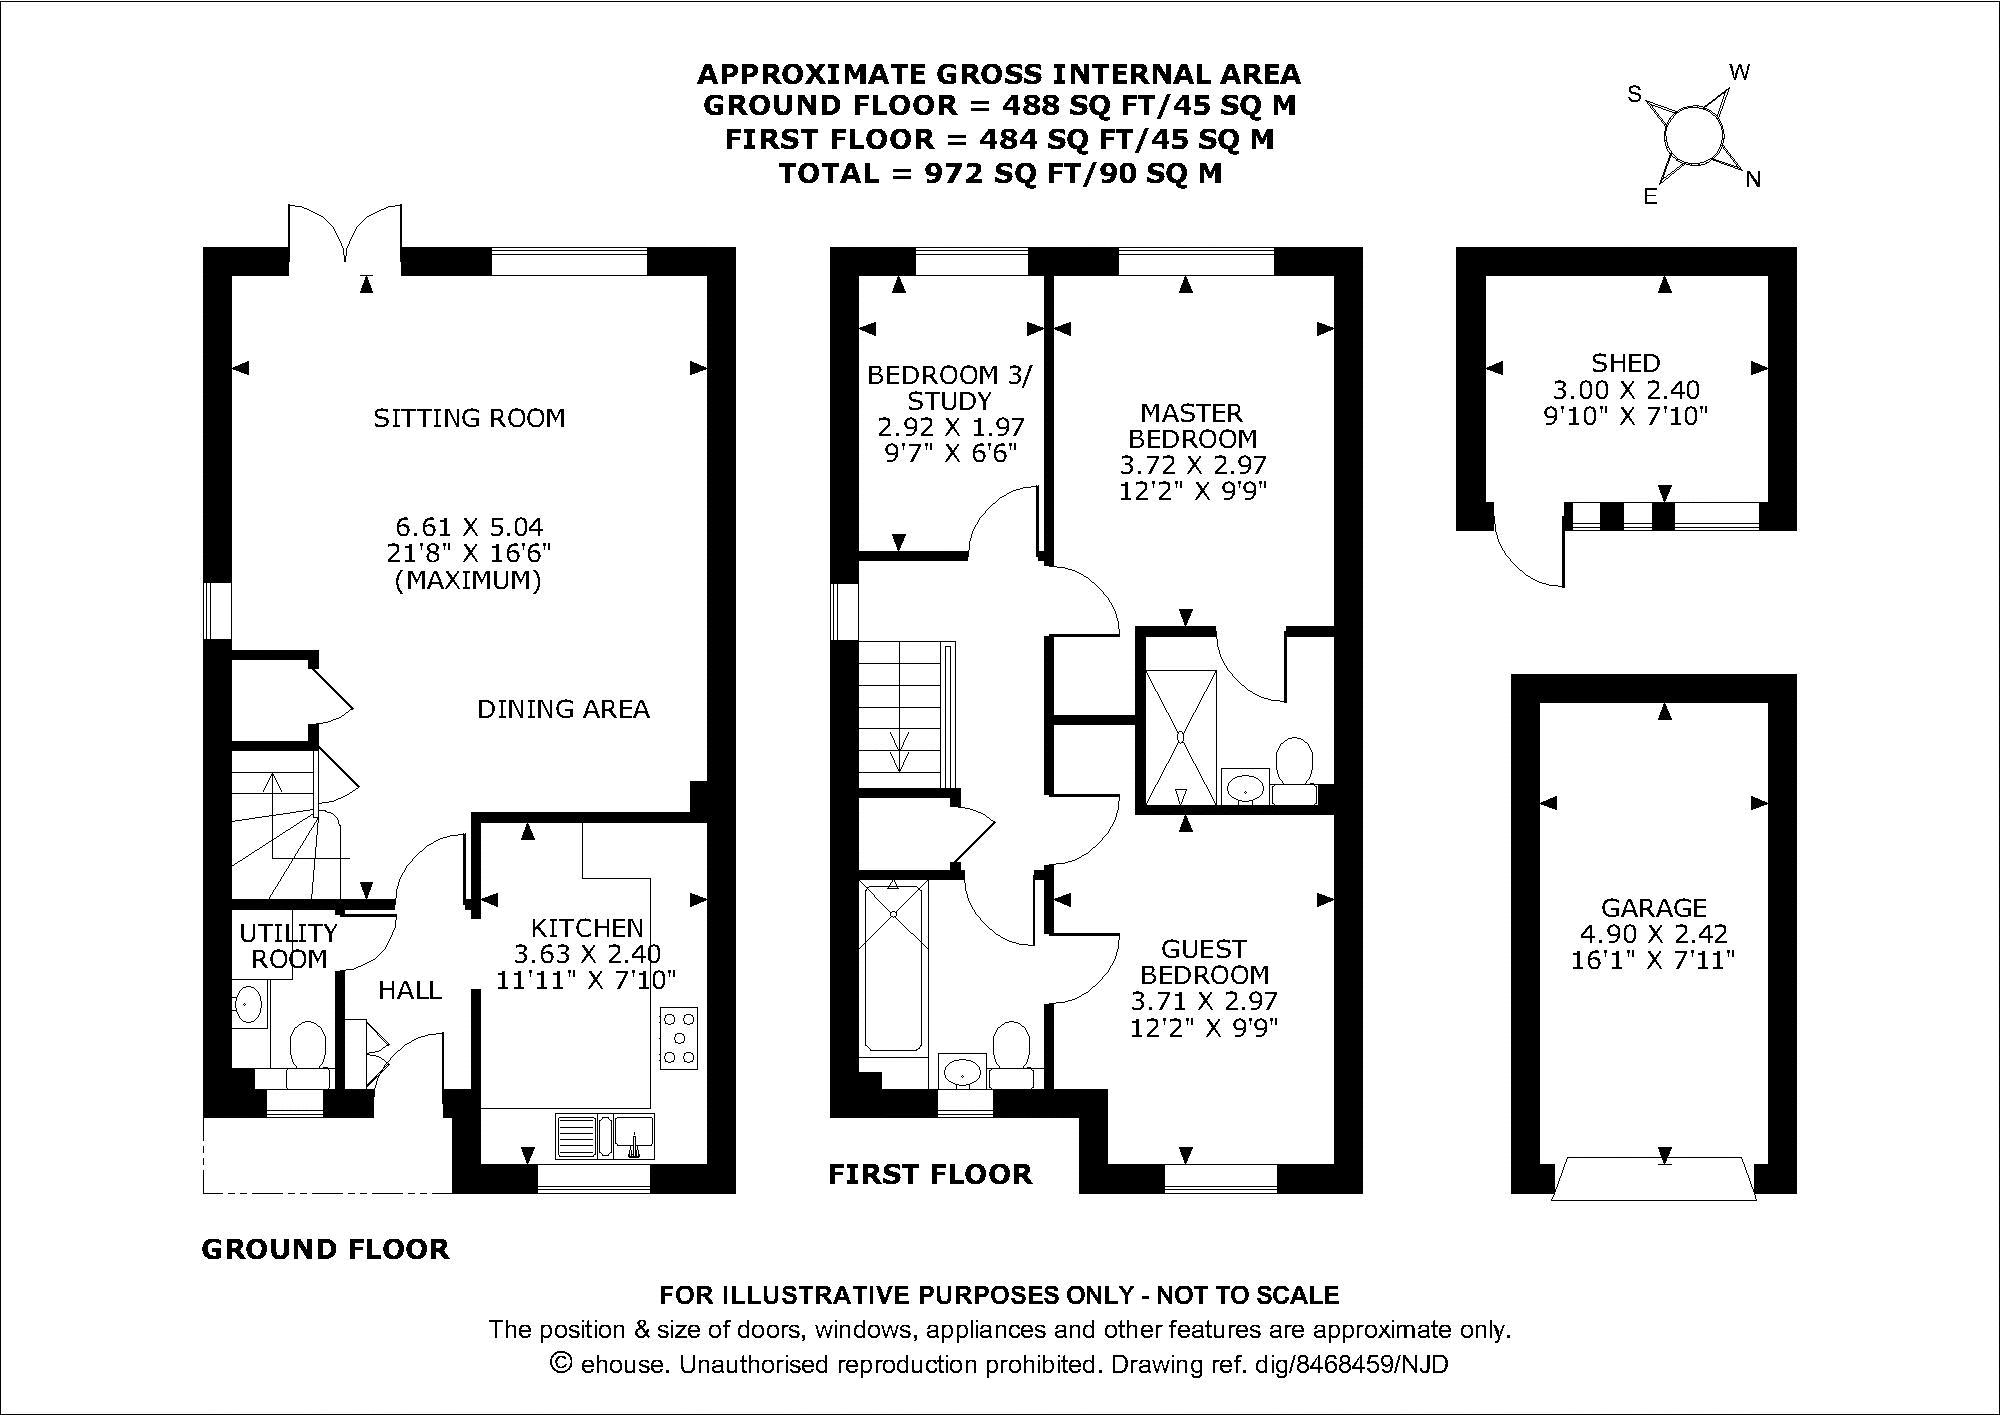 21 Leather Lane Floorplan